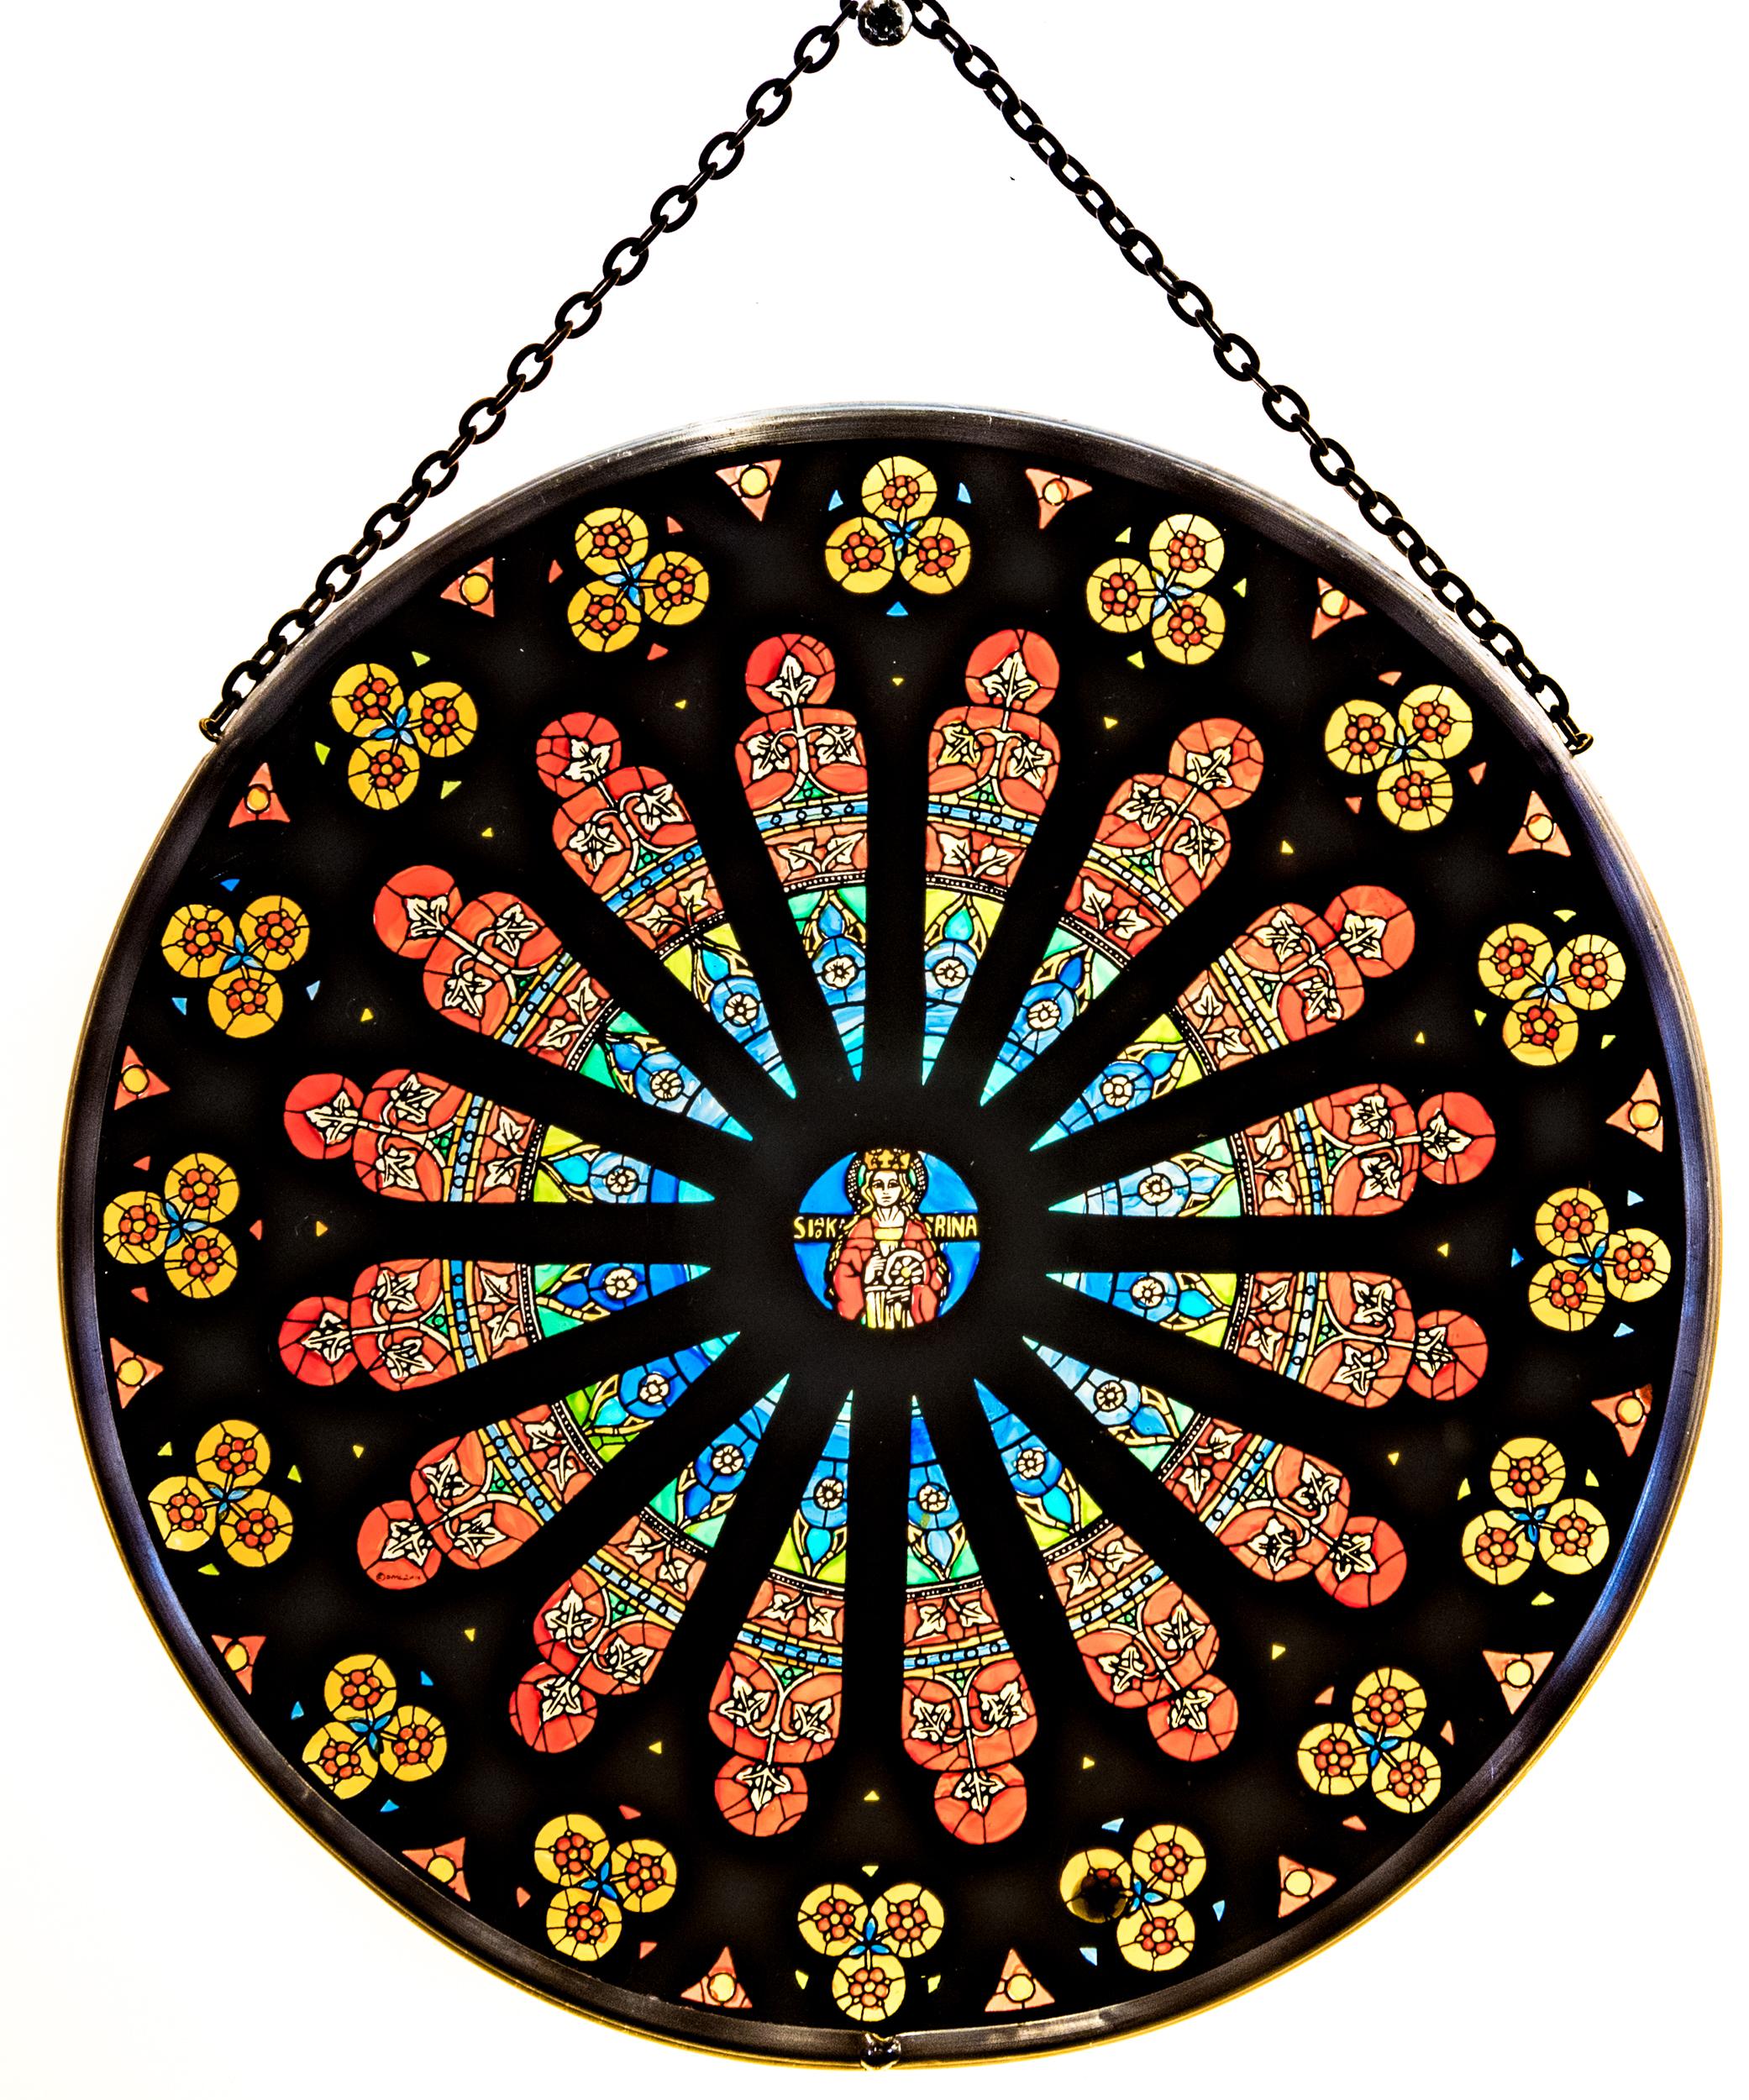 Fensterbild Kirchenfenstermotiv Rosette